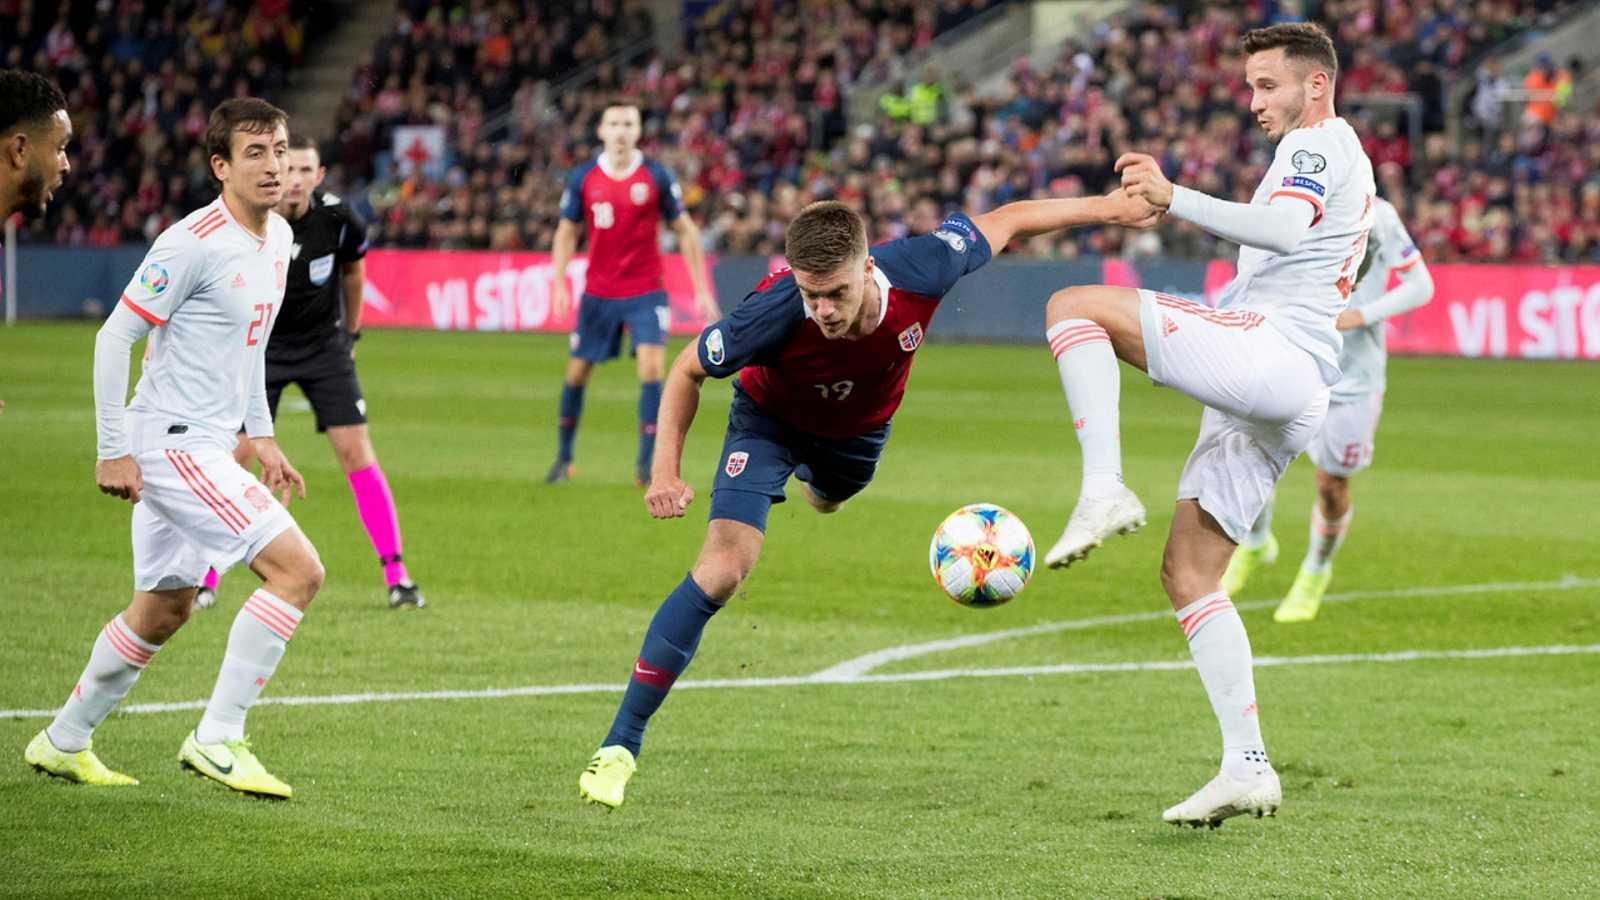 Fútbol - Programa Clasificación Eurocopa 2020 Previo: Noruega - España - ver ahora